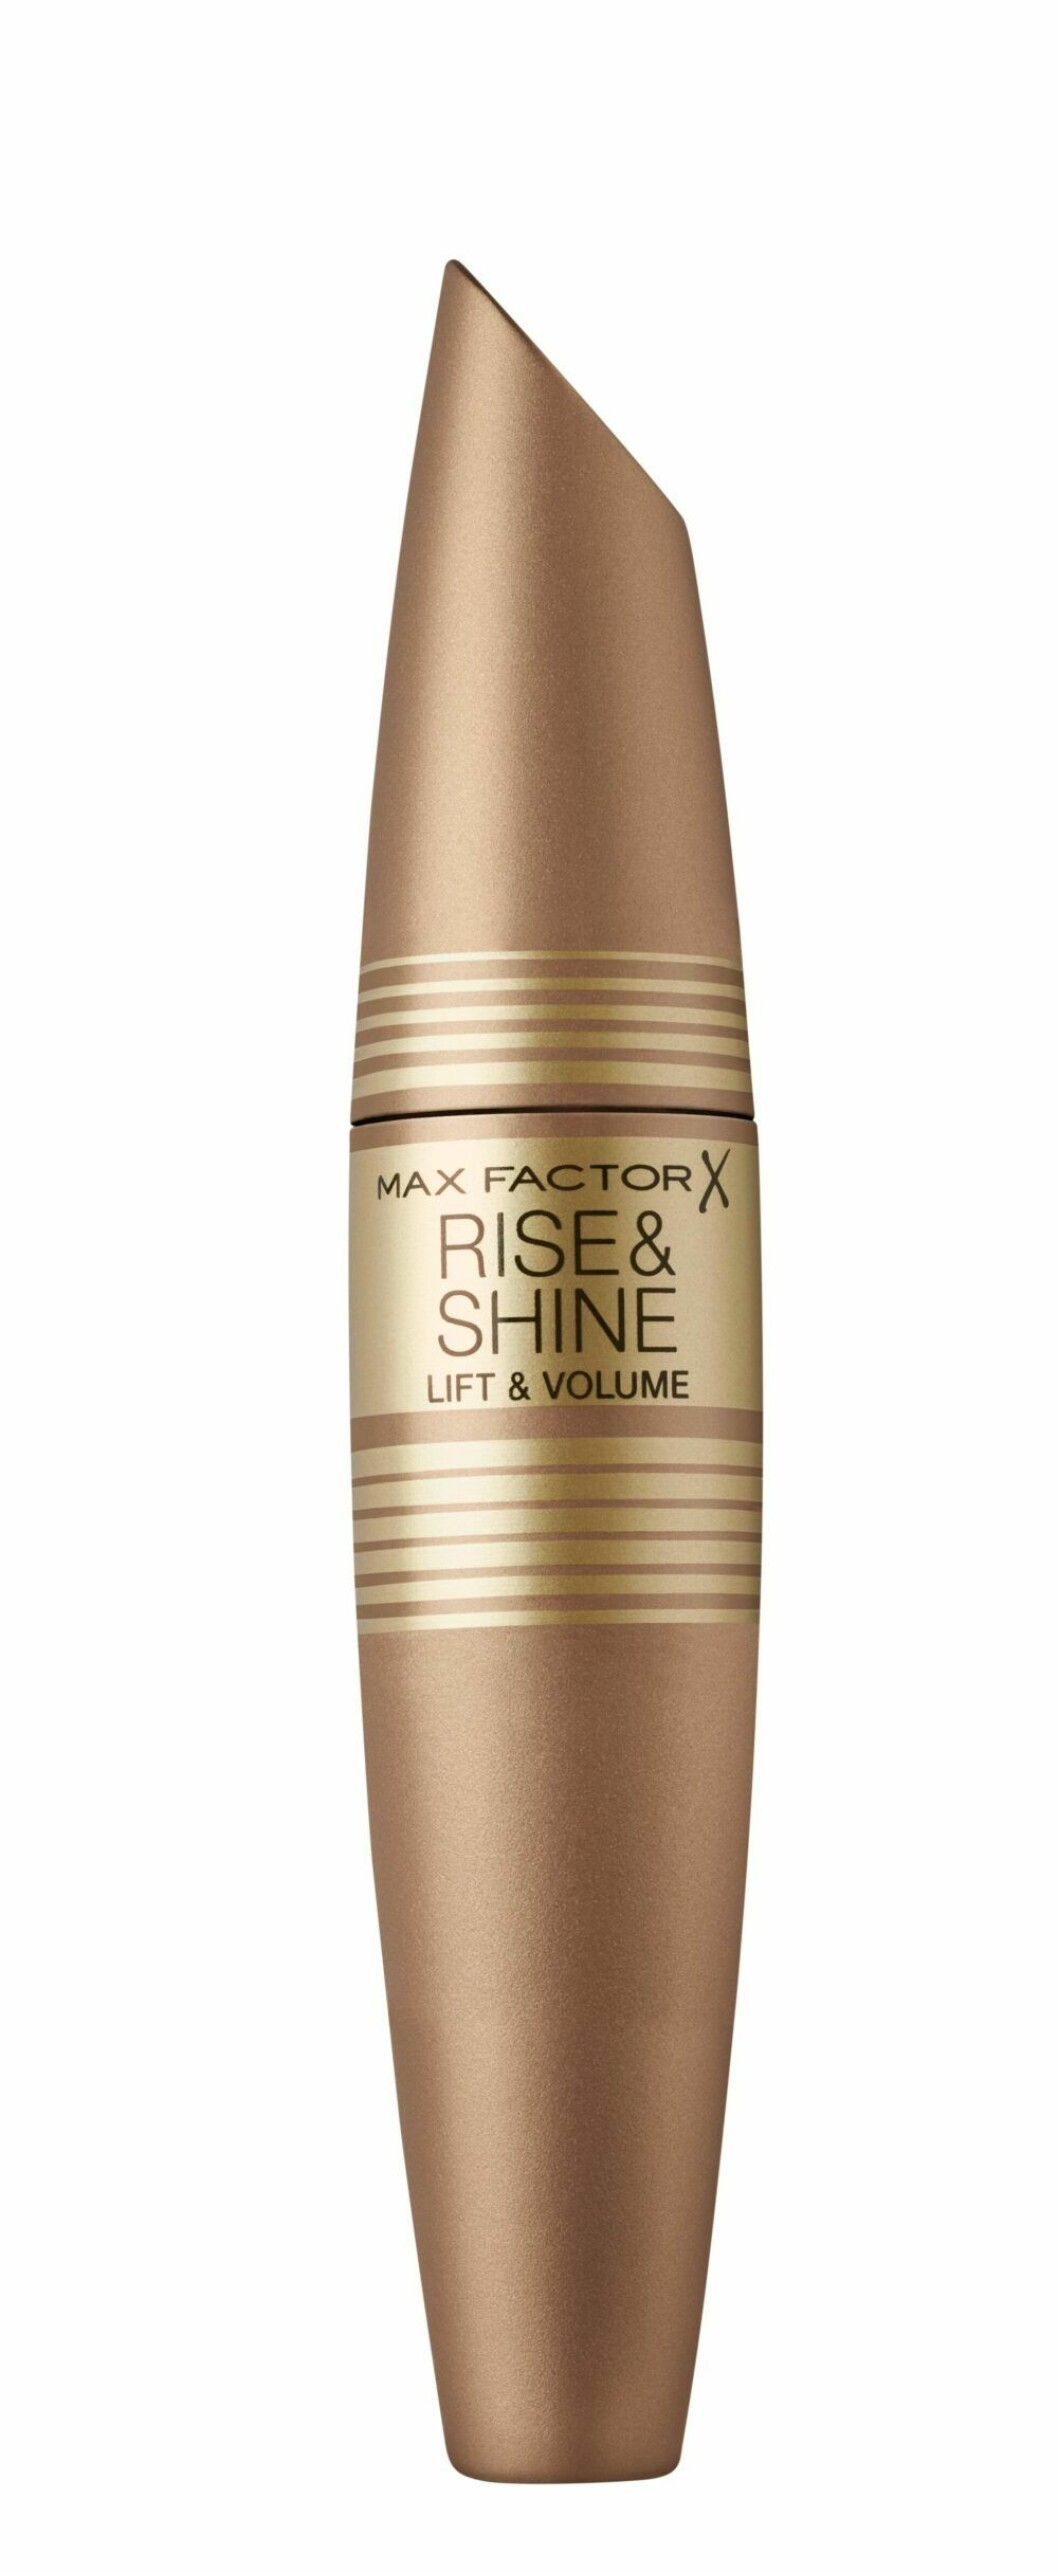 Max Factors nya mascara Rise & Shine.